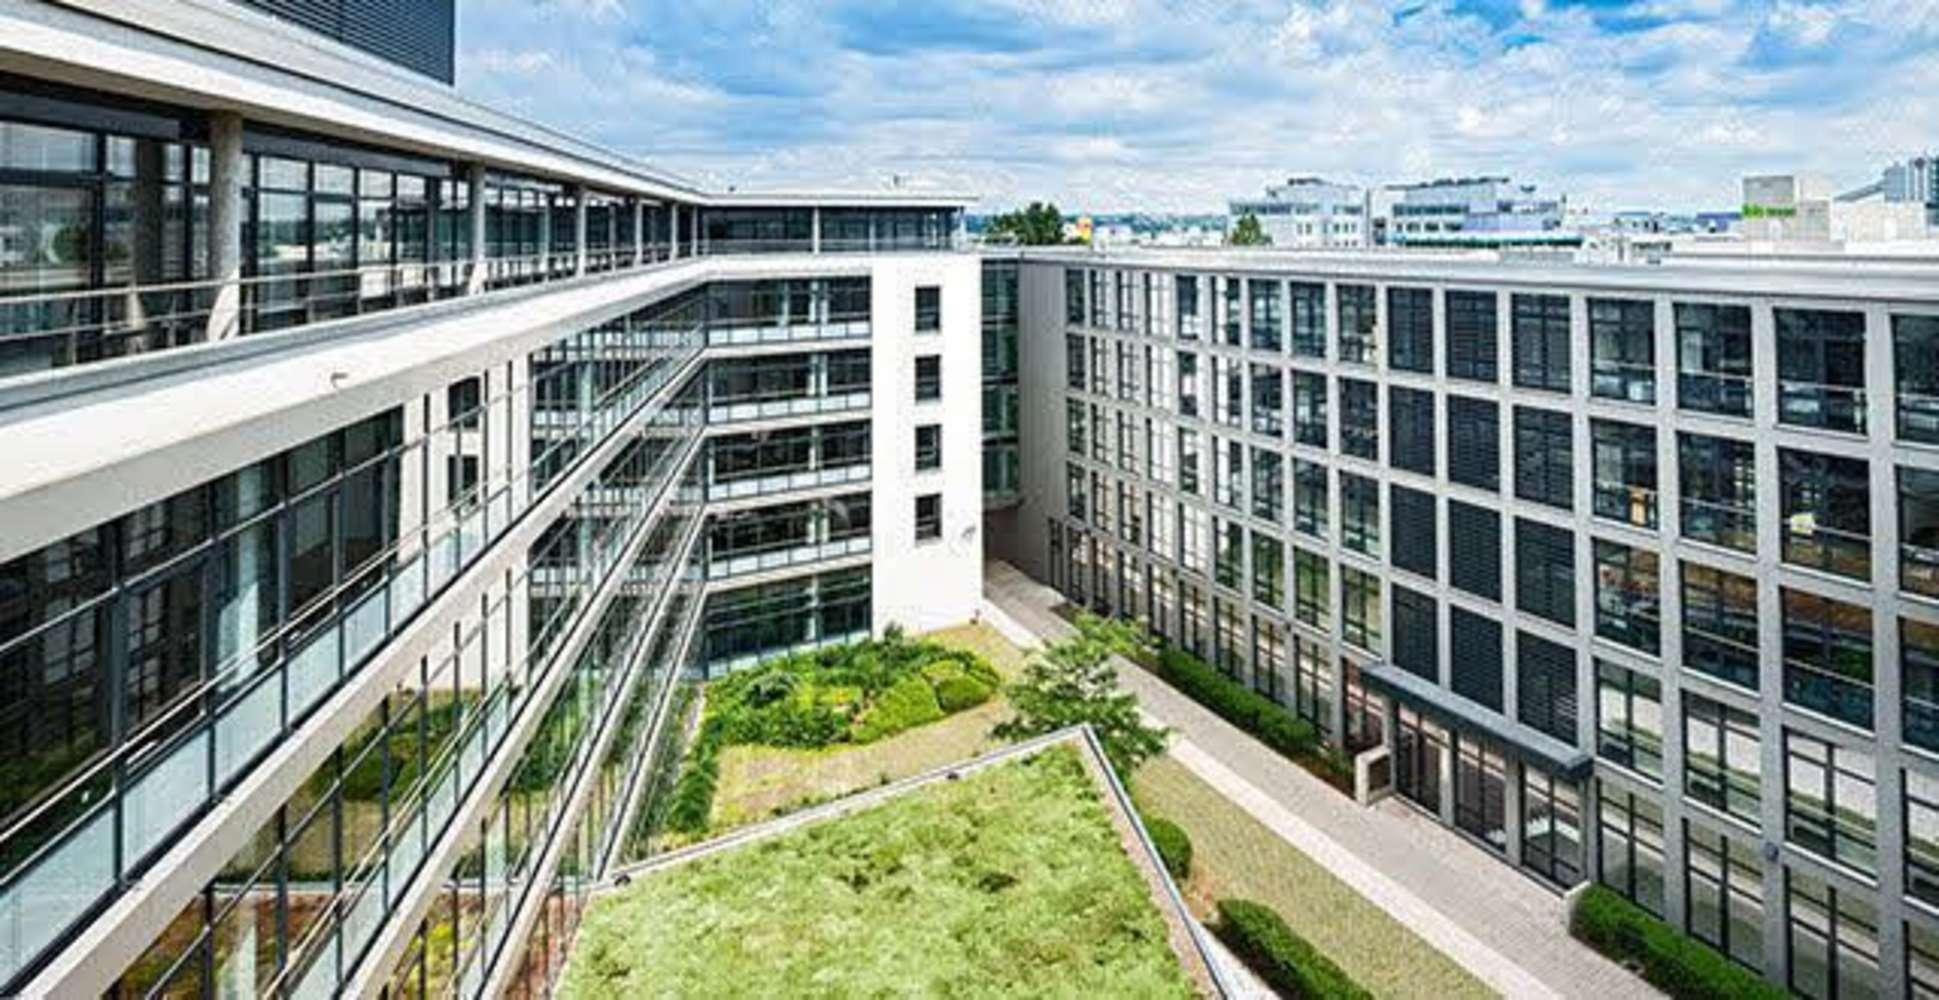 Büros Offenbach am main, 63067 - Büro - Offenbach am Main - F1148 - 10553604